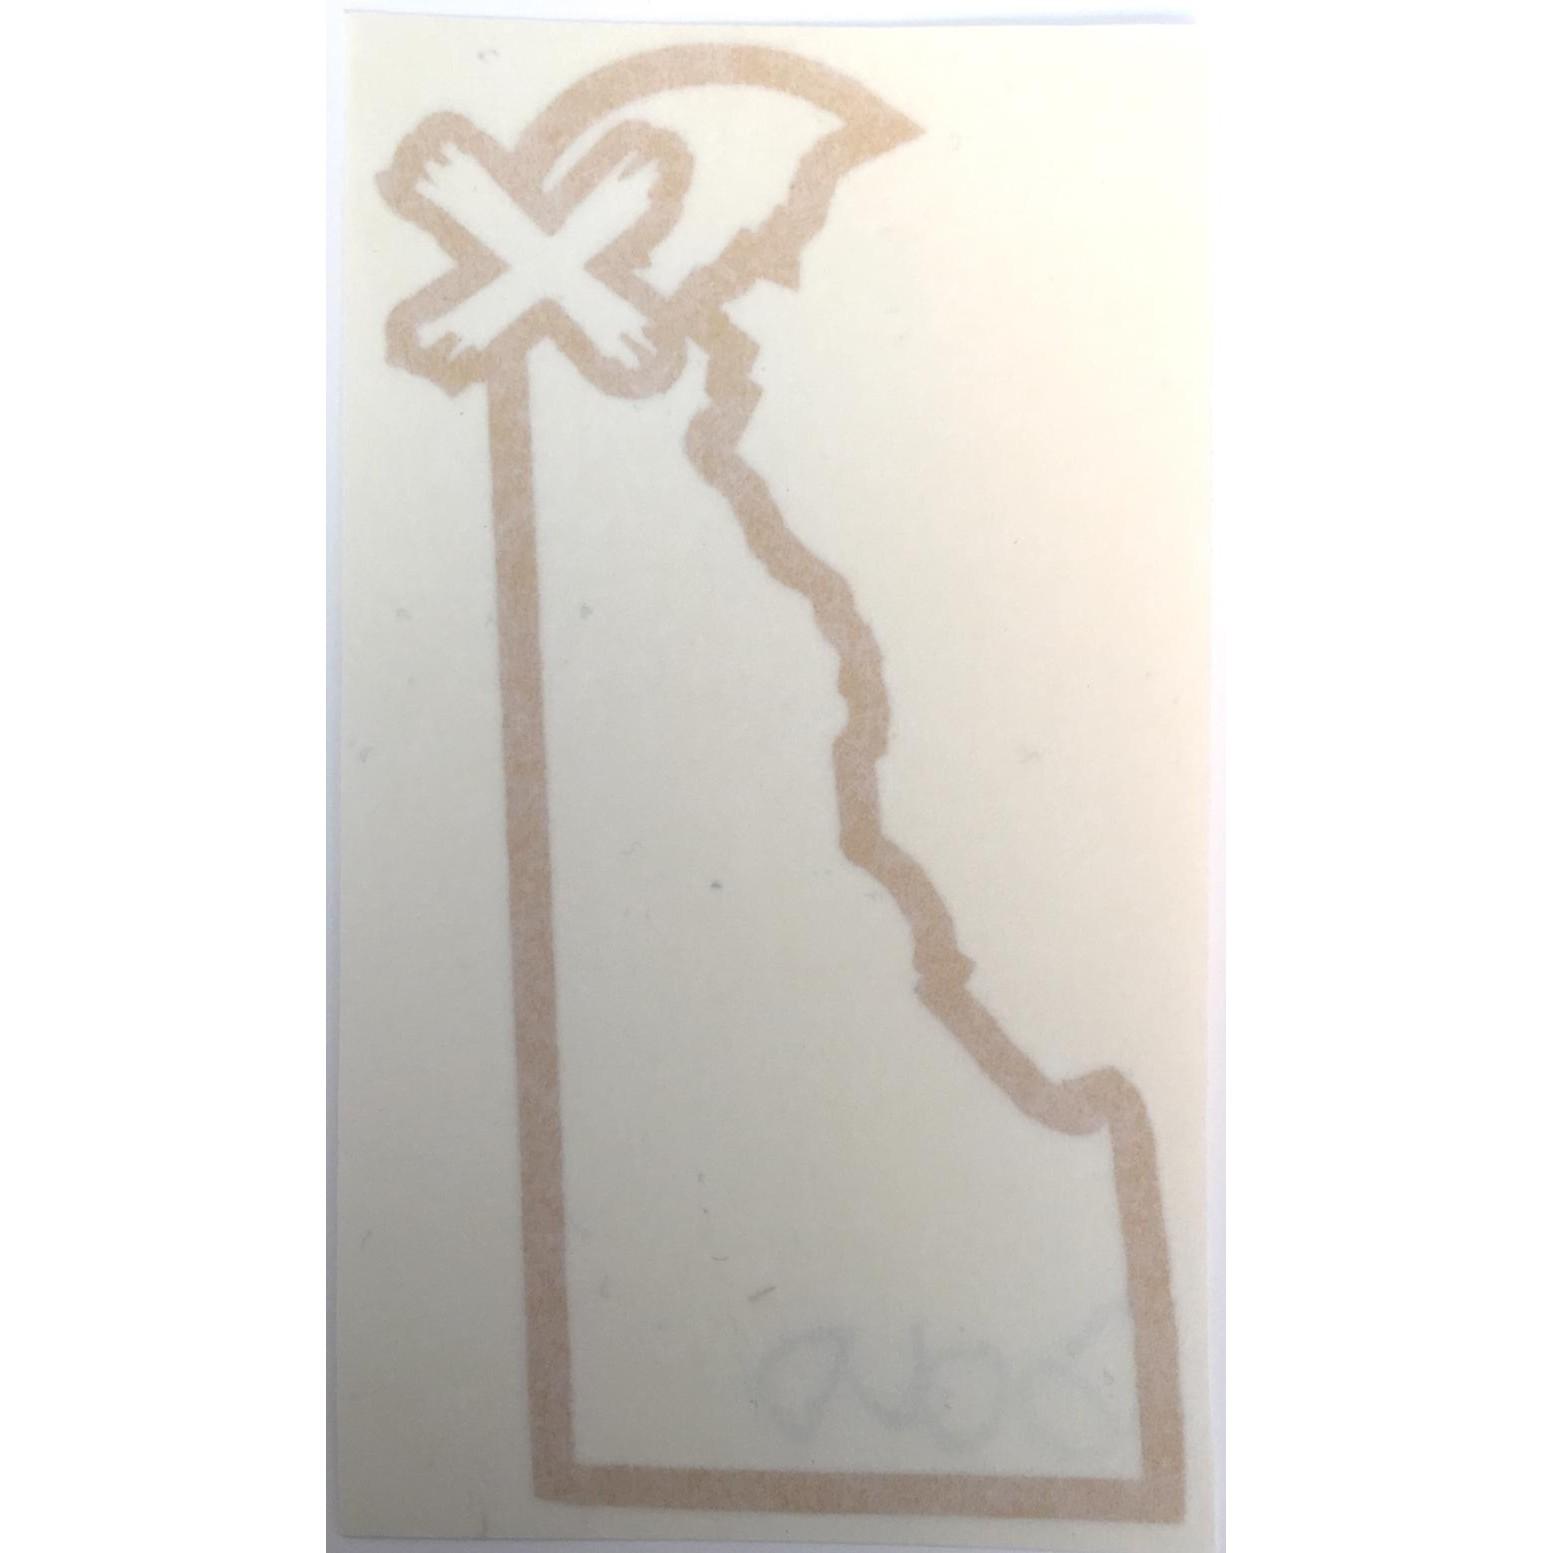 Delaware X Newark V1 4.75x2.5 Die Cut (Gold Foil)